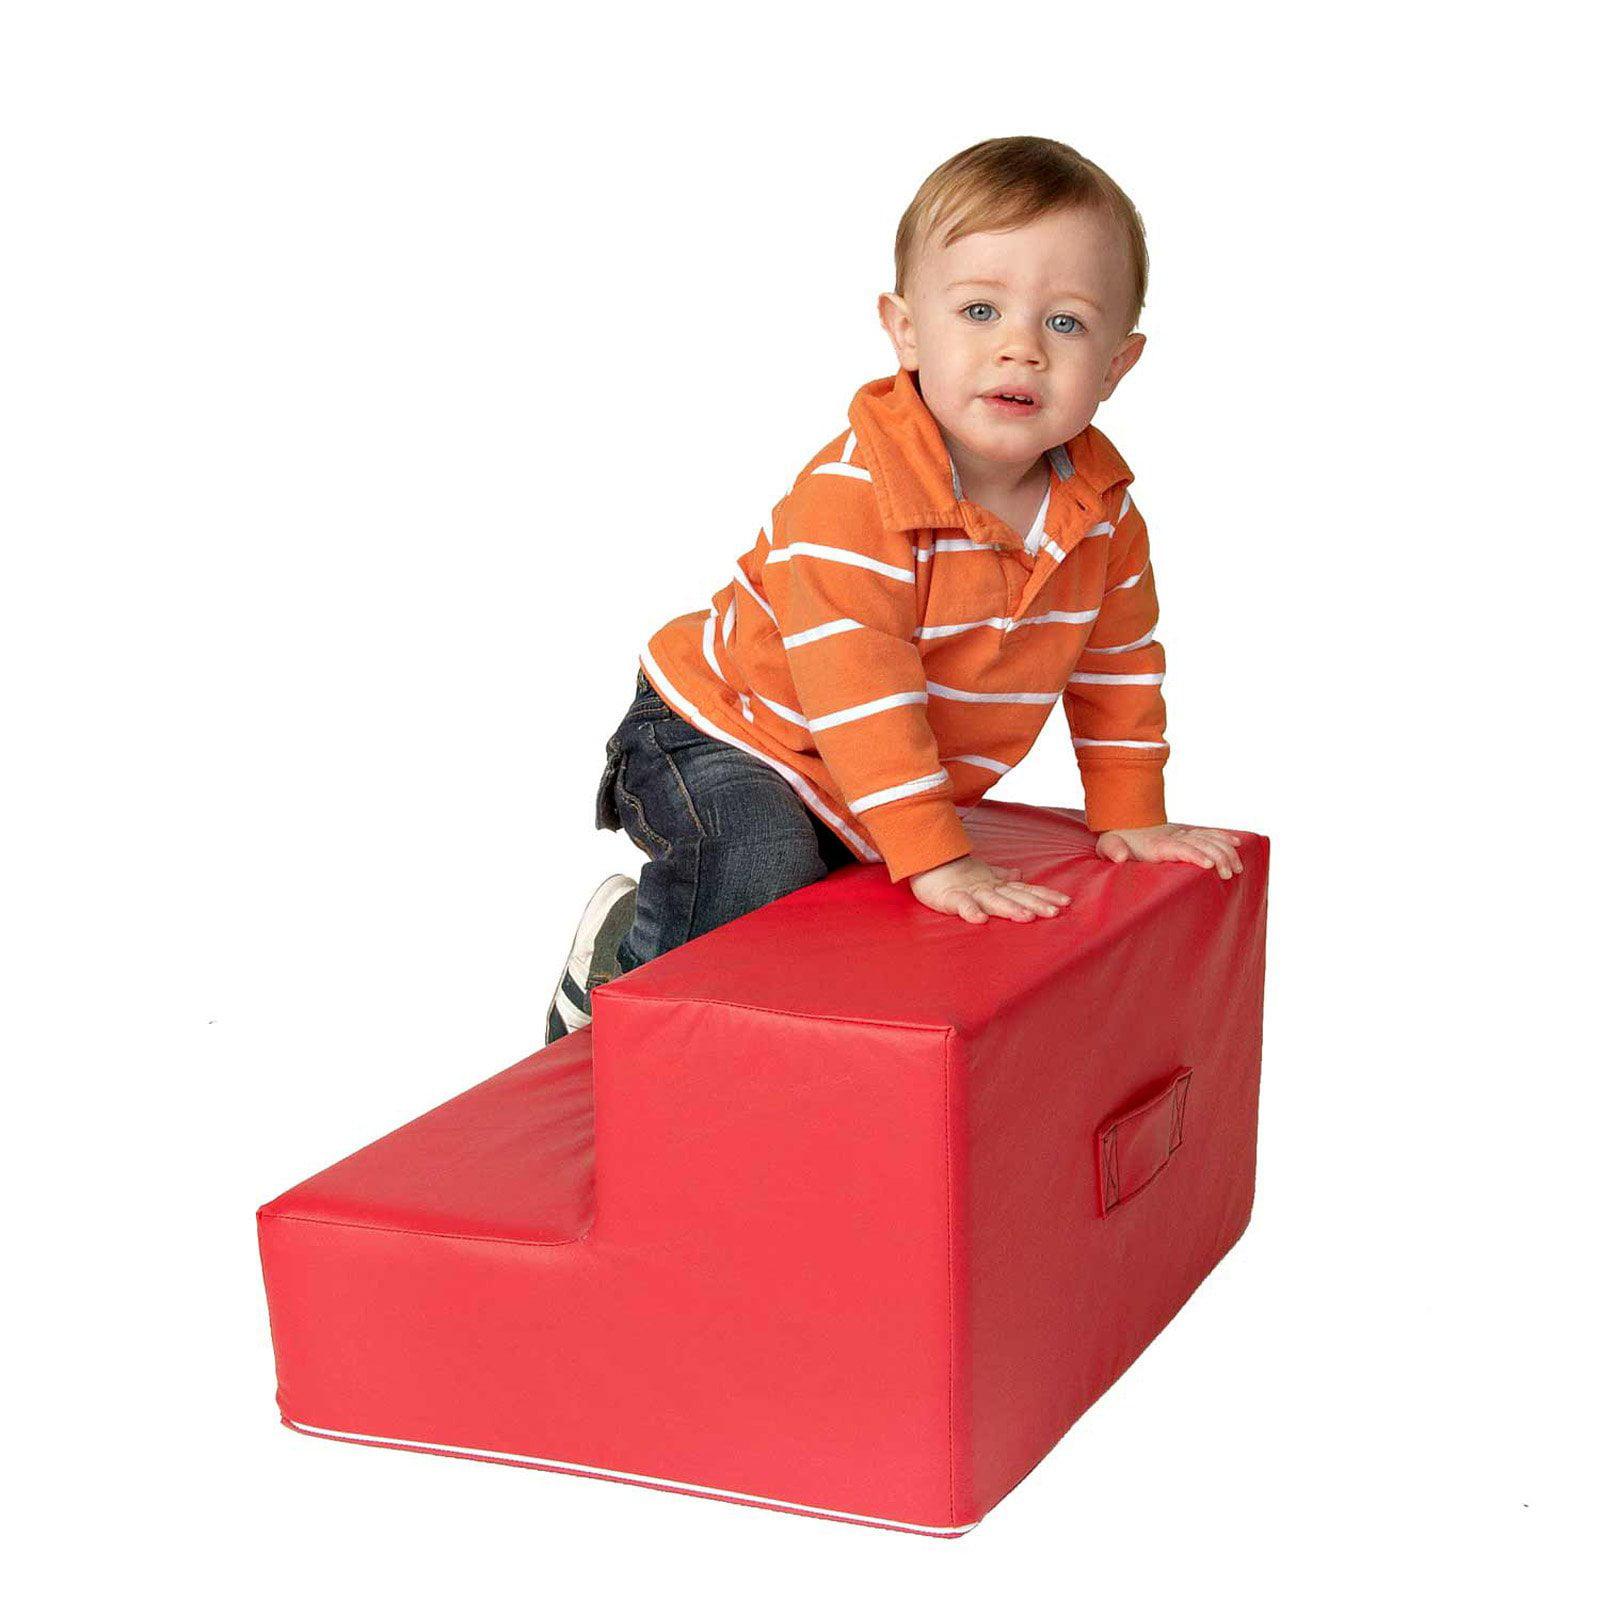 Foamnasium Toddler Step Soft Play by Foamnasium